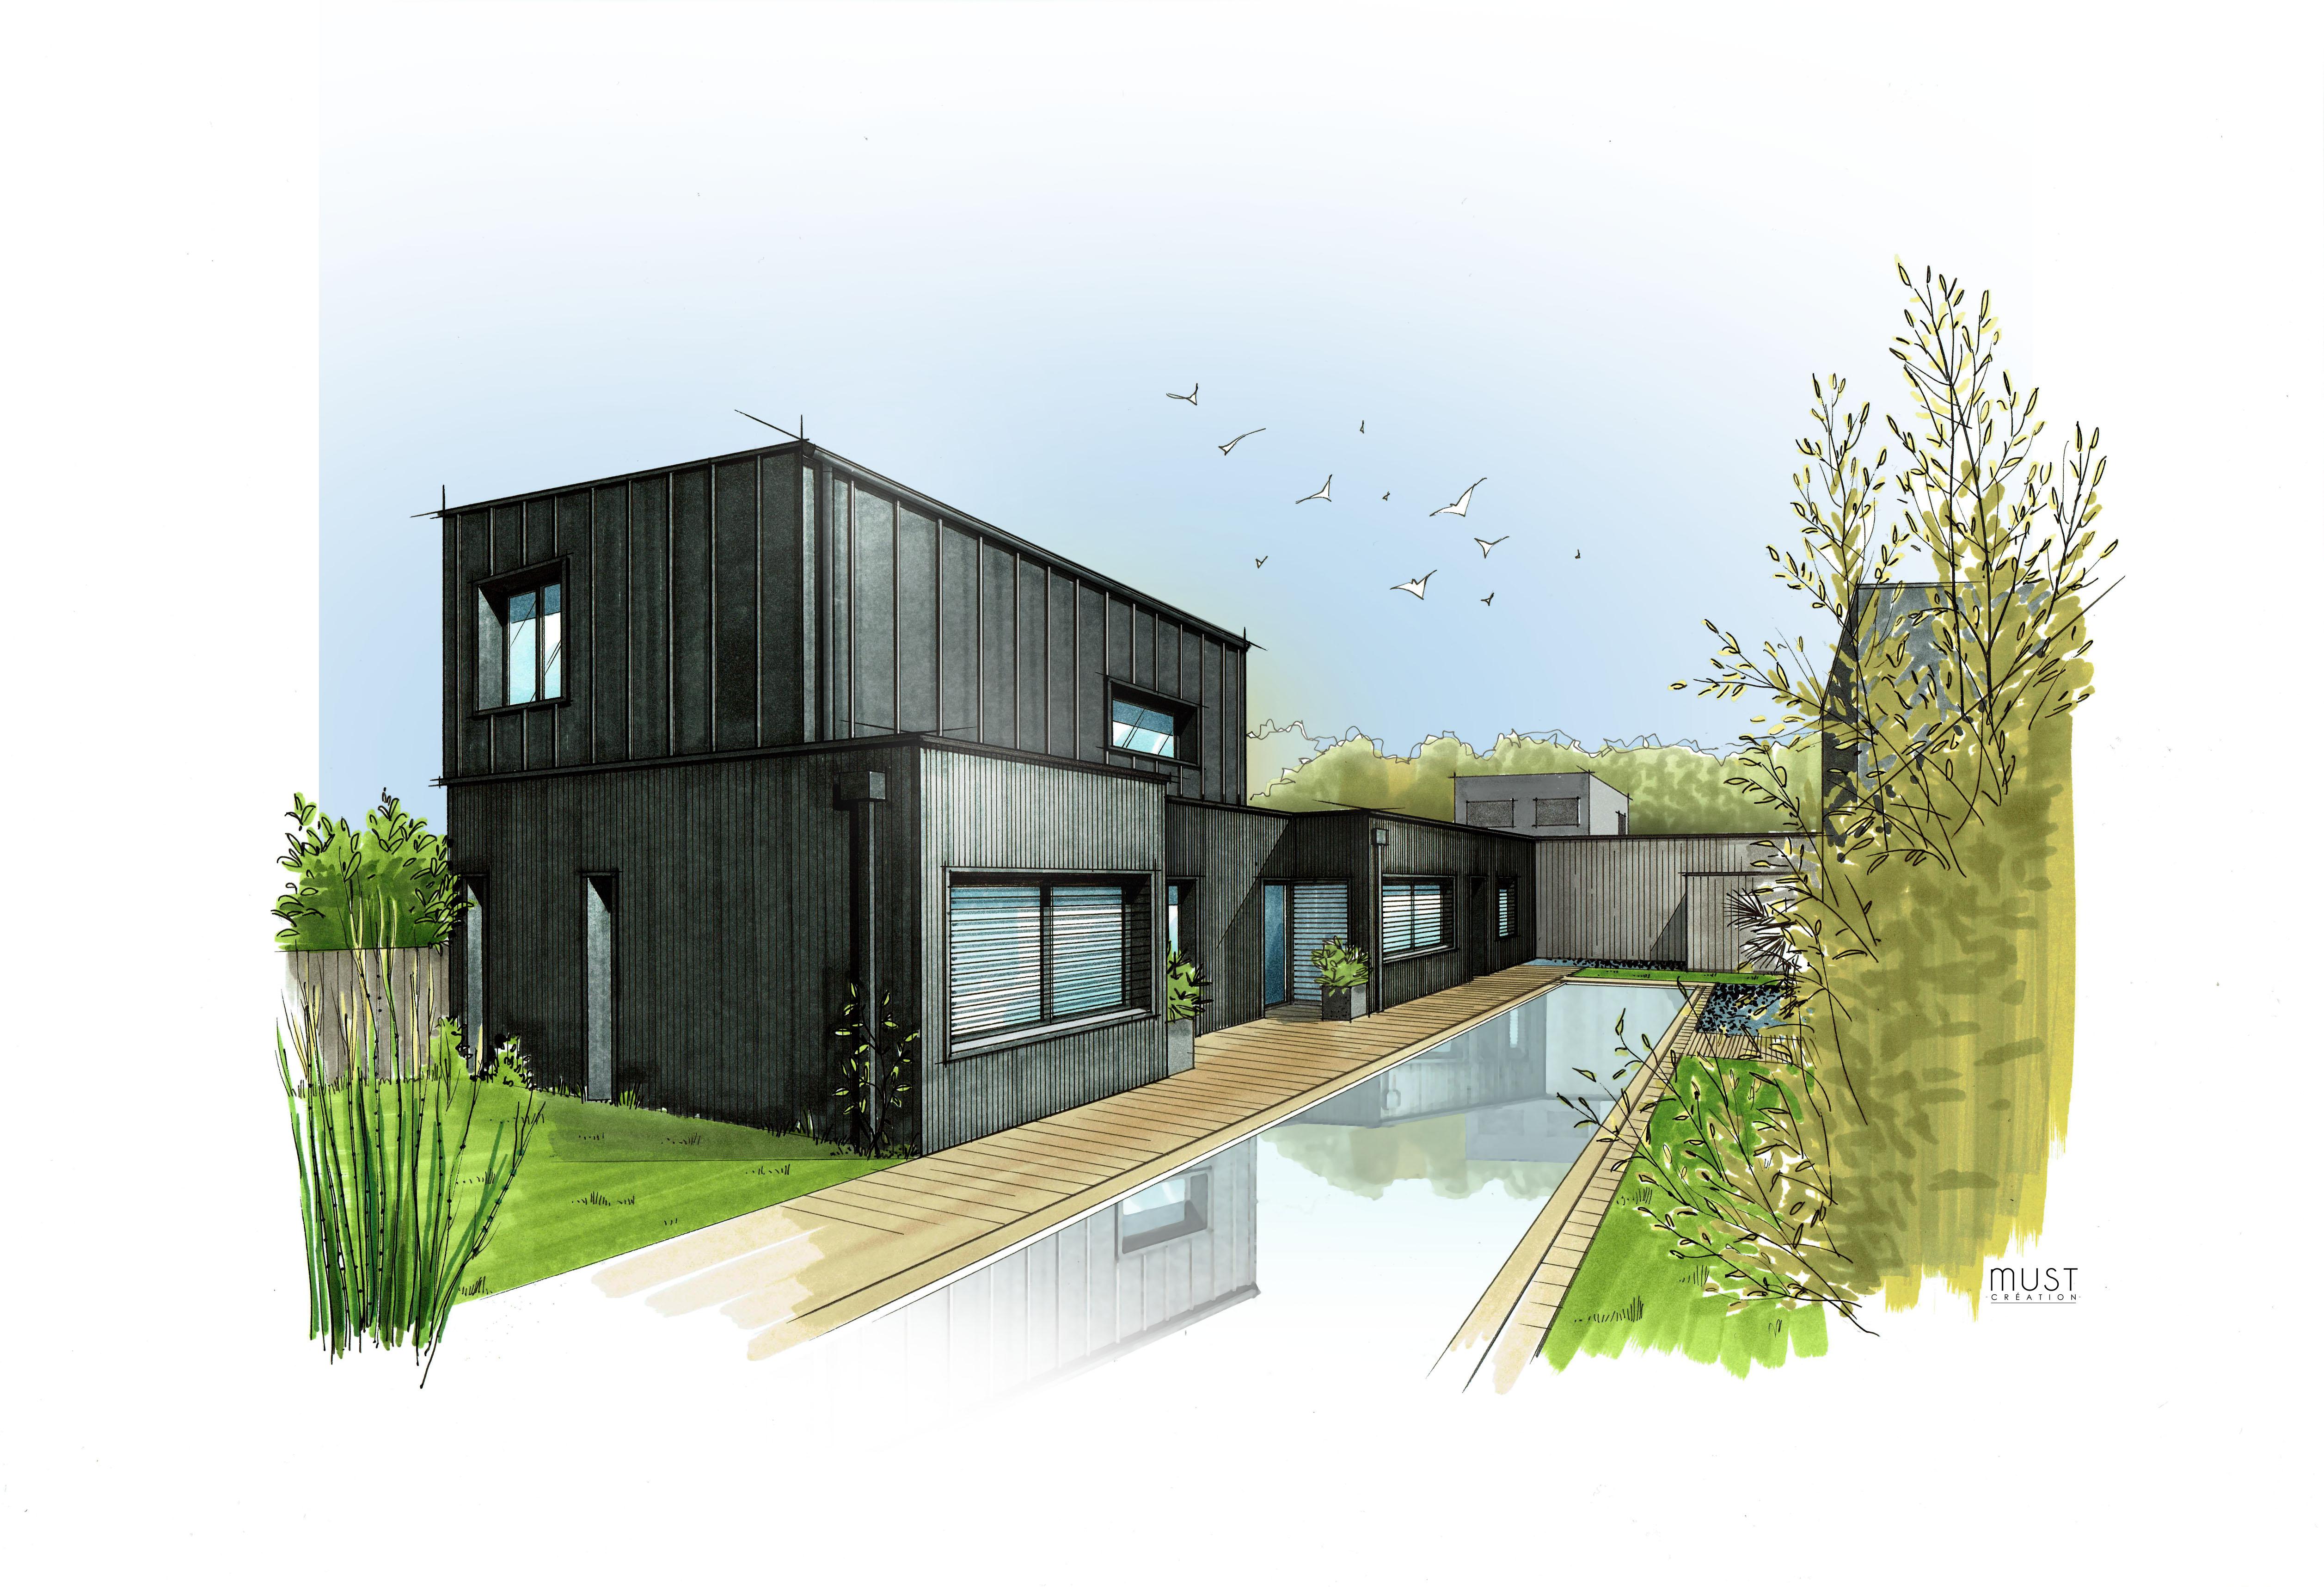 meej-architecture-extension-surelevation-rennes